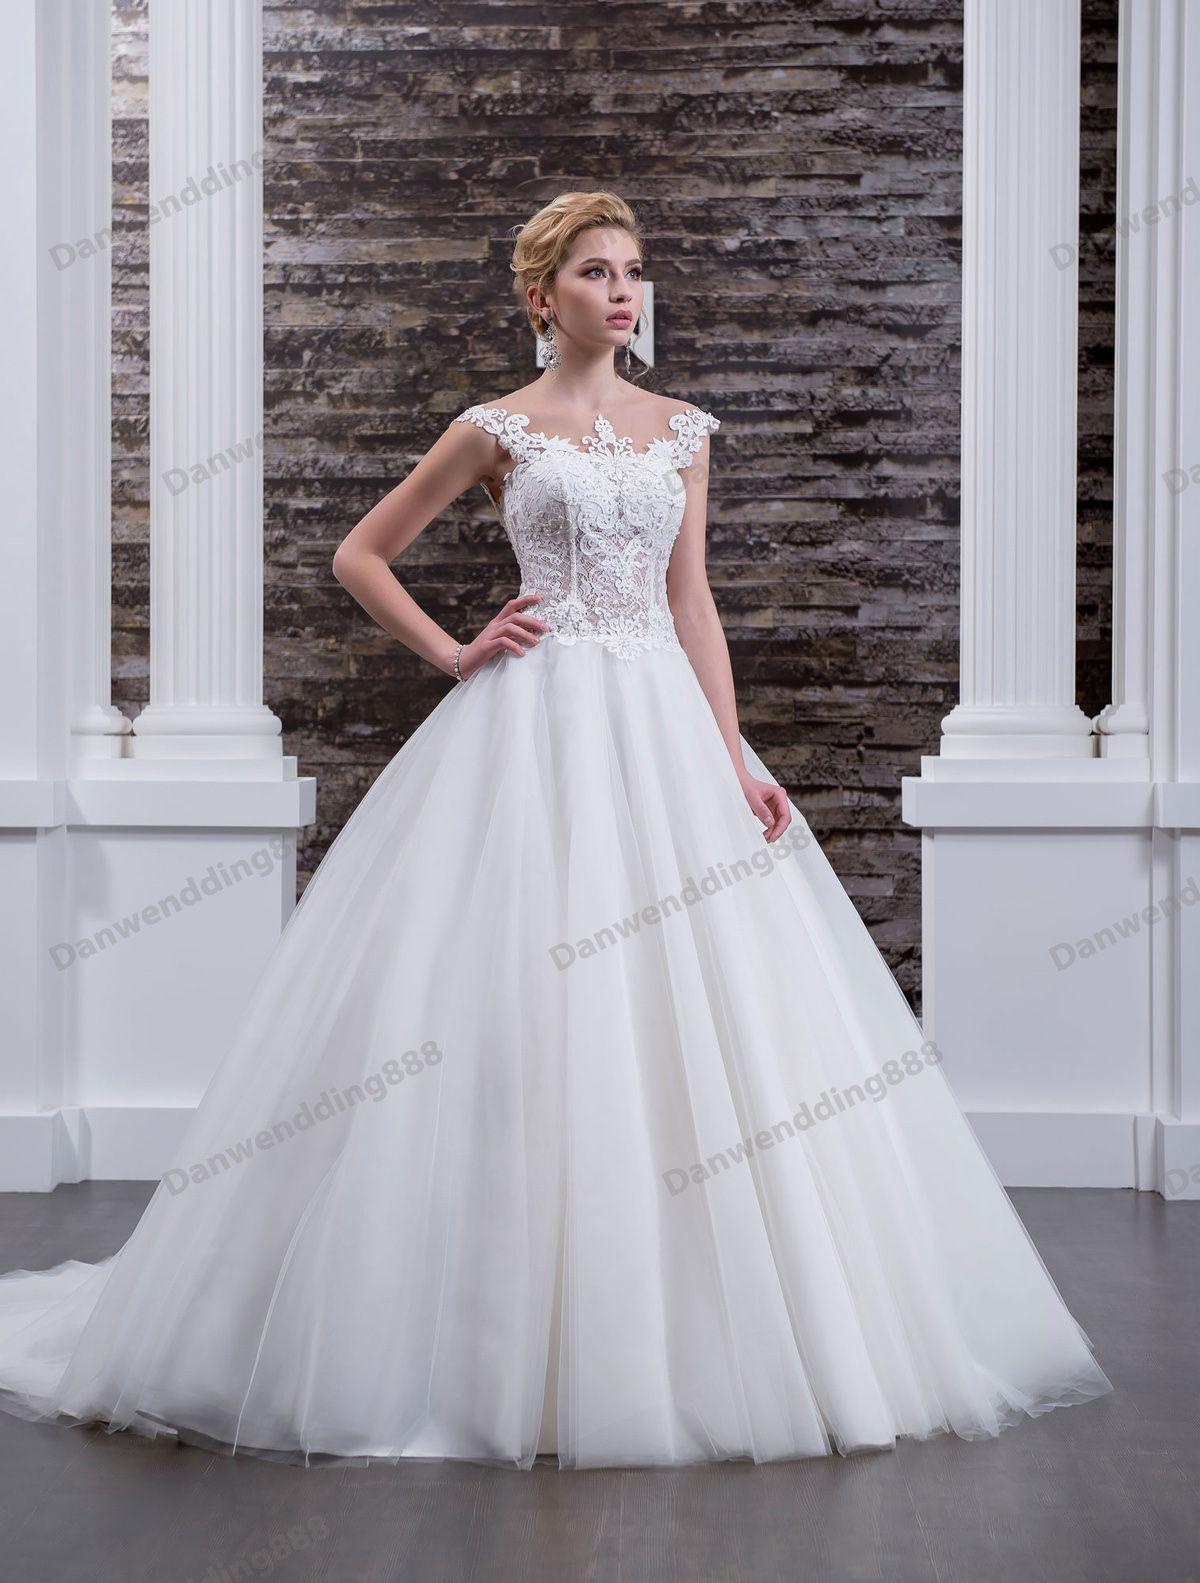 Charming White Tulle Jewel Applique Beads A-Line Wedding Dresses Bridal Pageant Dresses Wedding Attire Dresses Custom Size 2-16 ZW608068